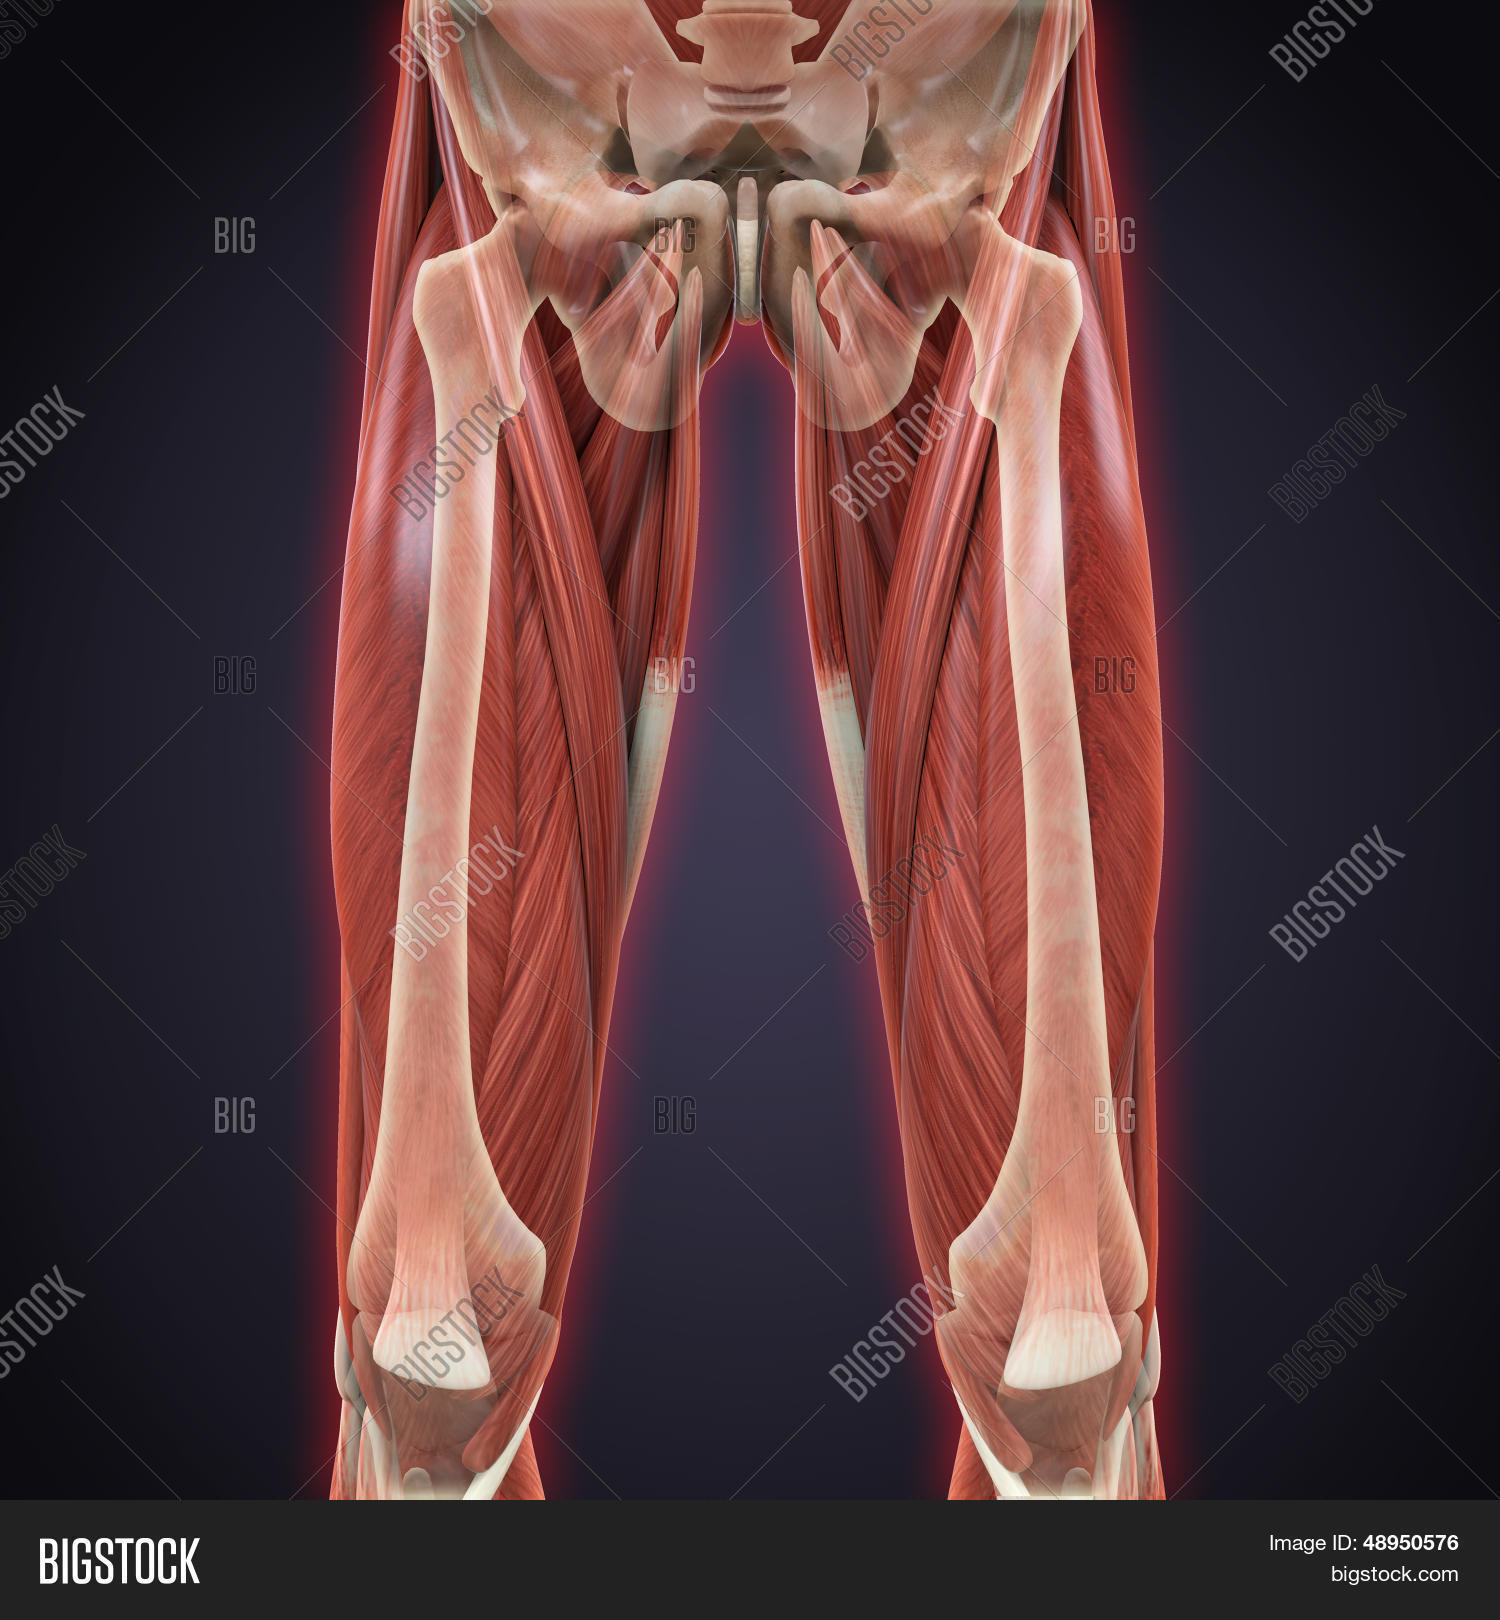 Upper Legs Muscles Anatomy Image & Photo | Bigstock